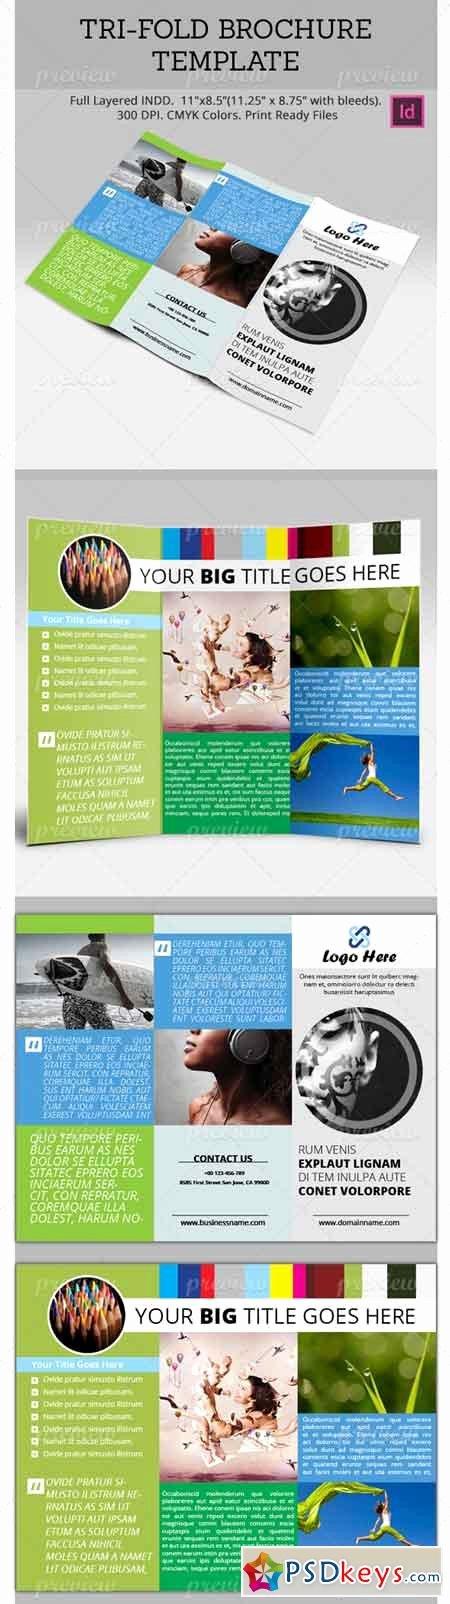 Tri Fold Brochure Template 2049 Free Download Shop